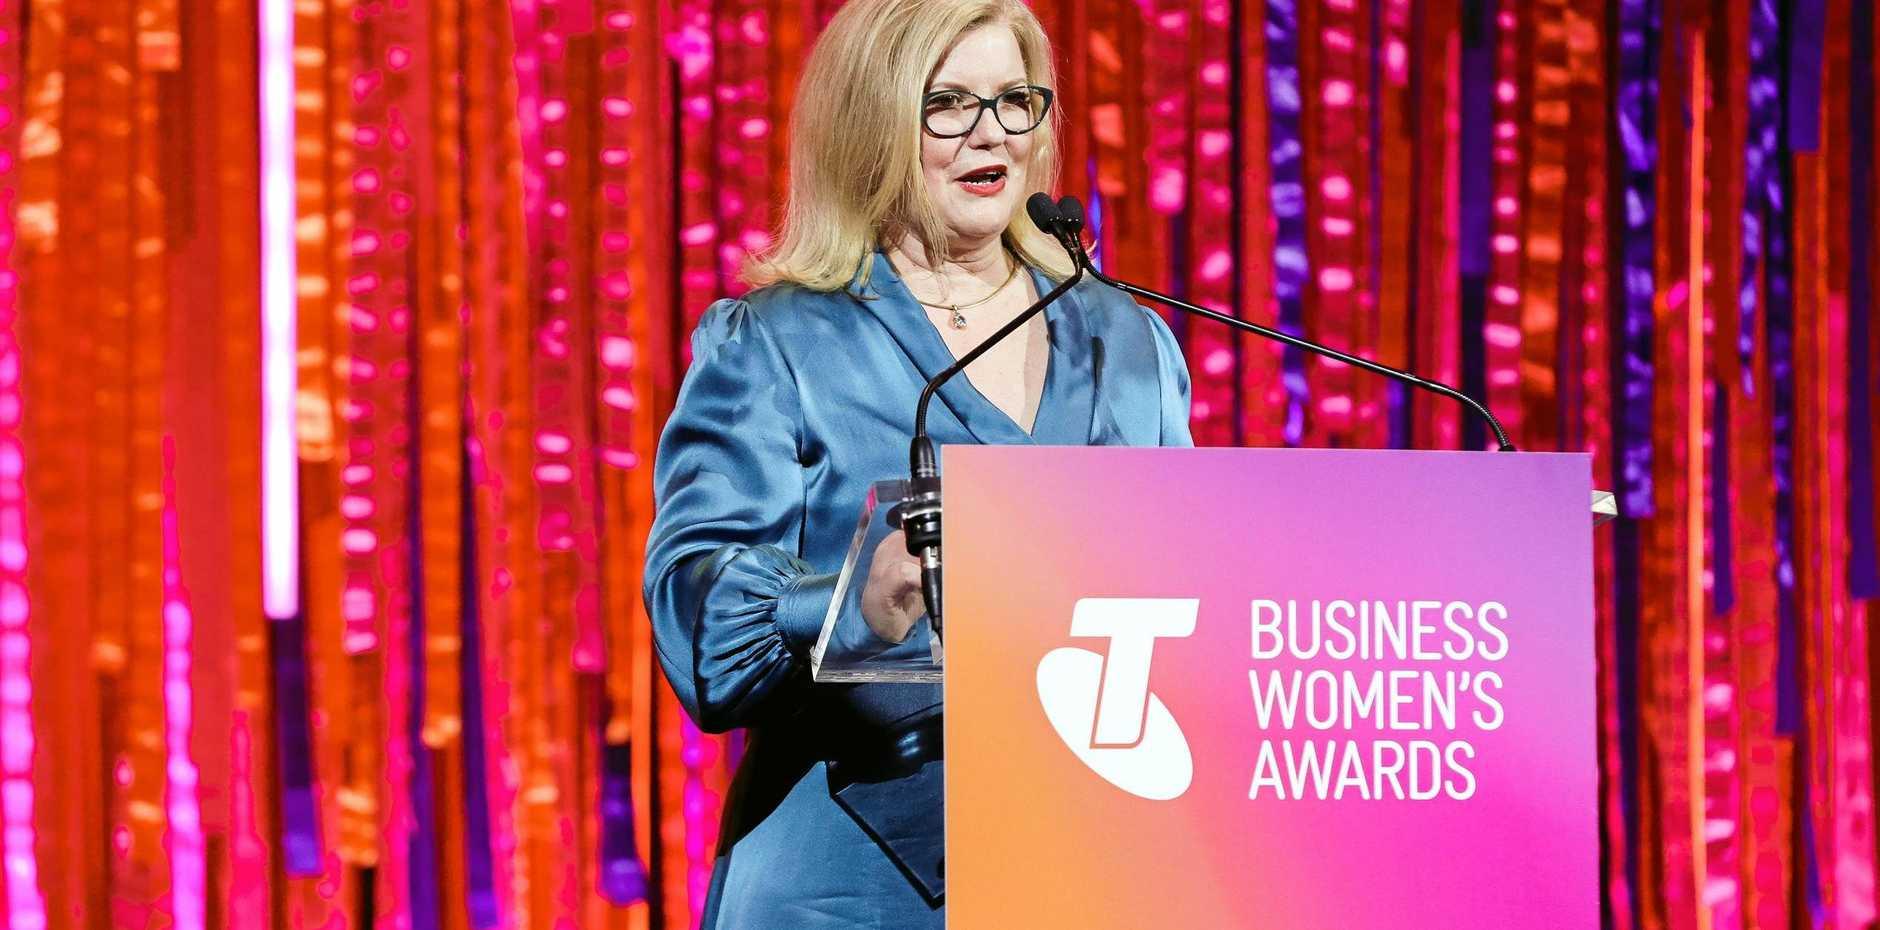 CONGRATULATIONS: Telstra Australian Business Women's Award 2019 winner, NewDirection Care's founder and CEO Natasha Chadwick.